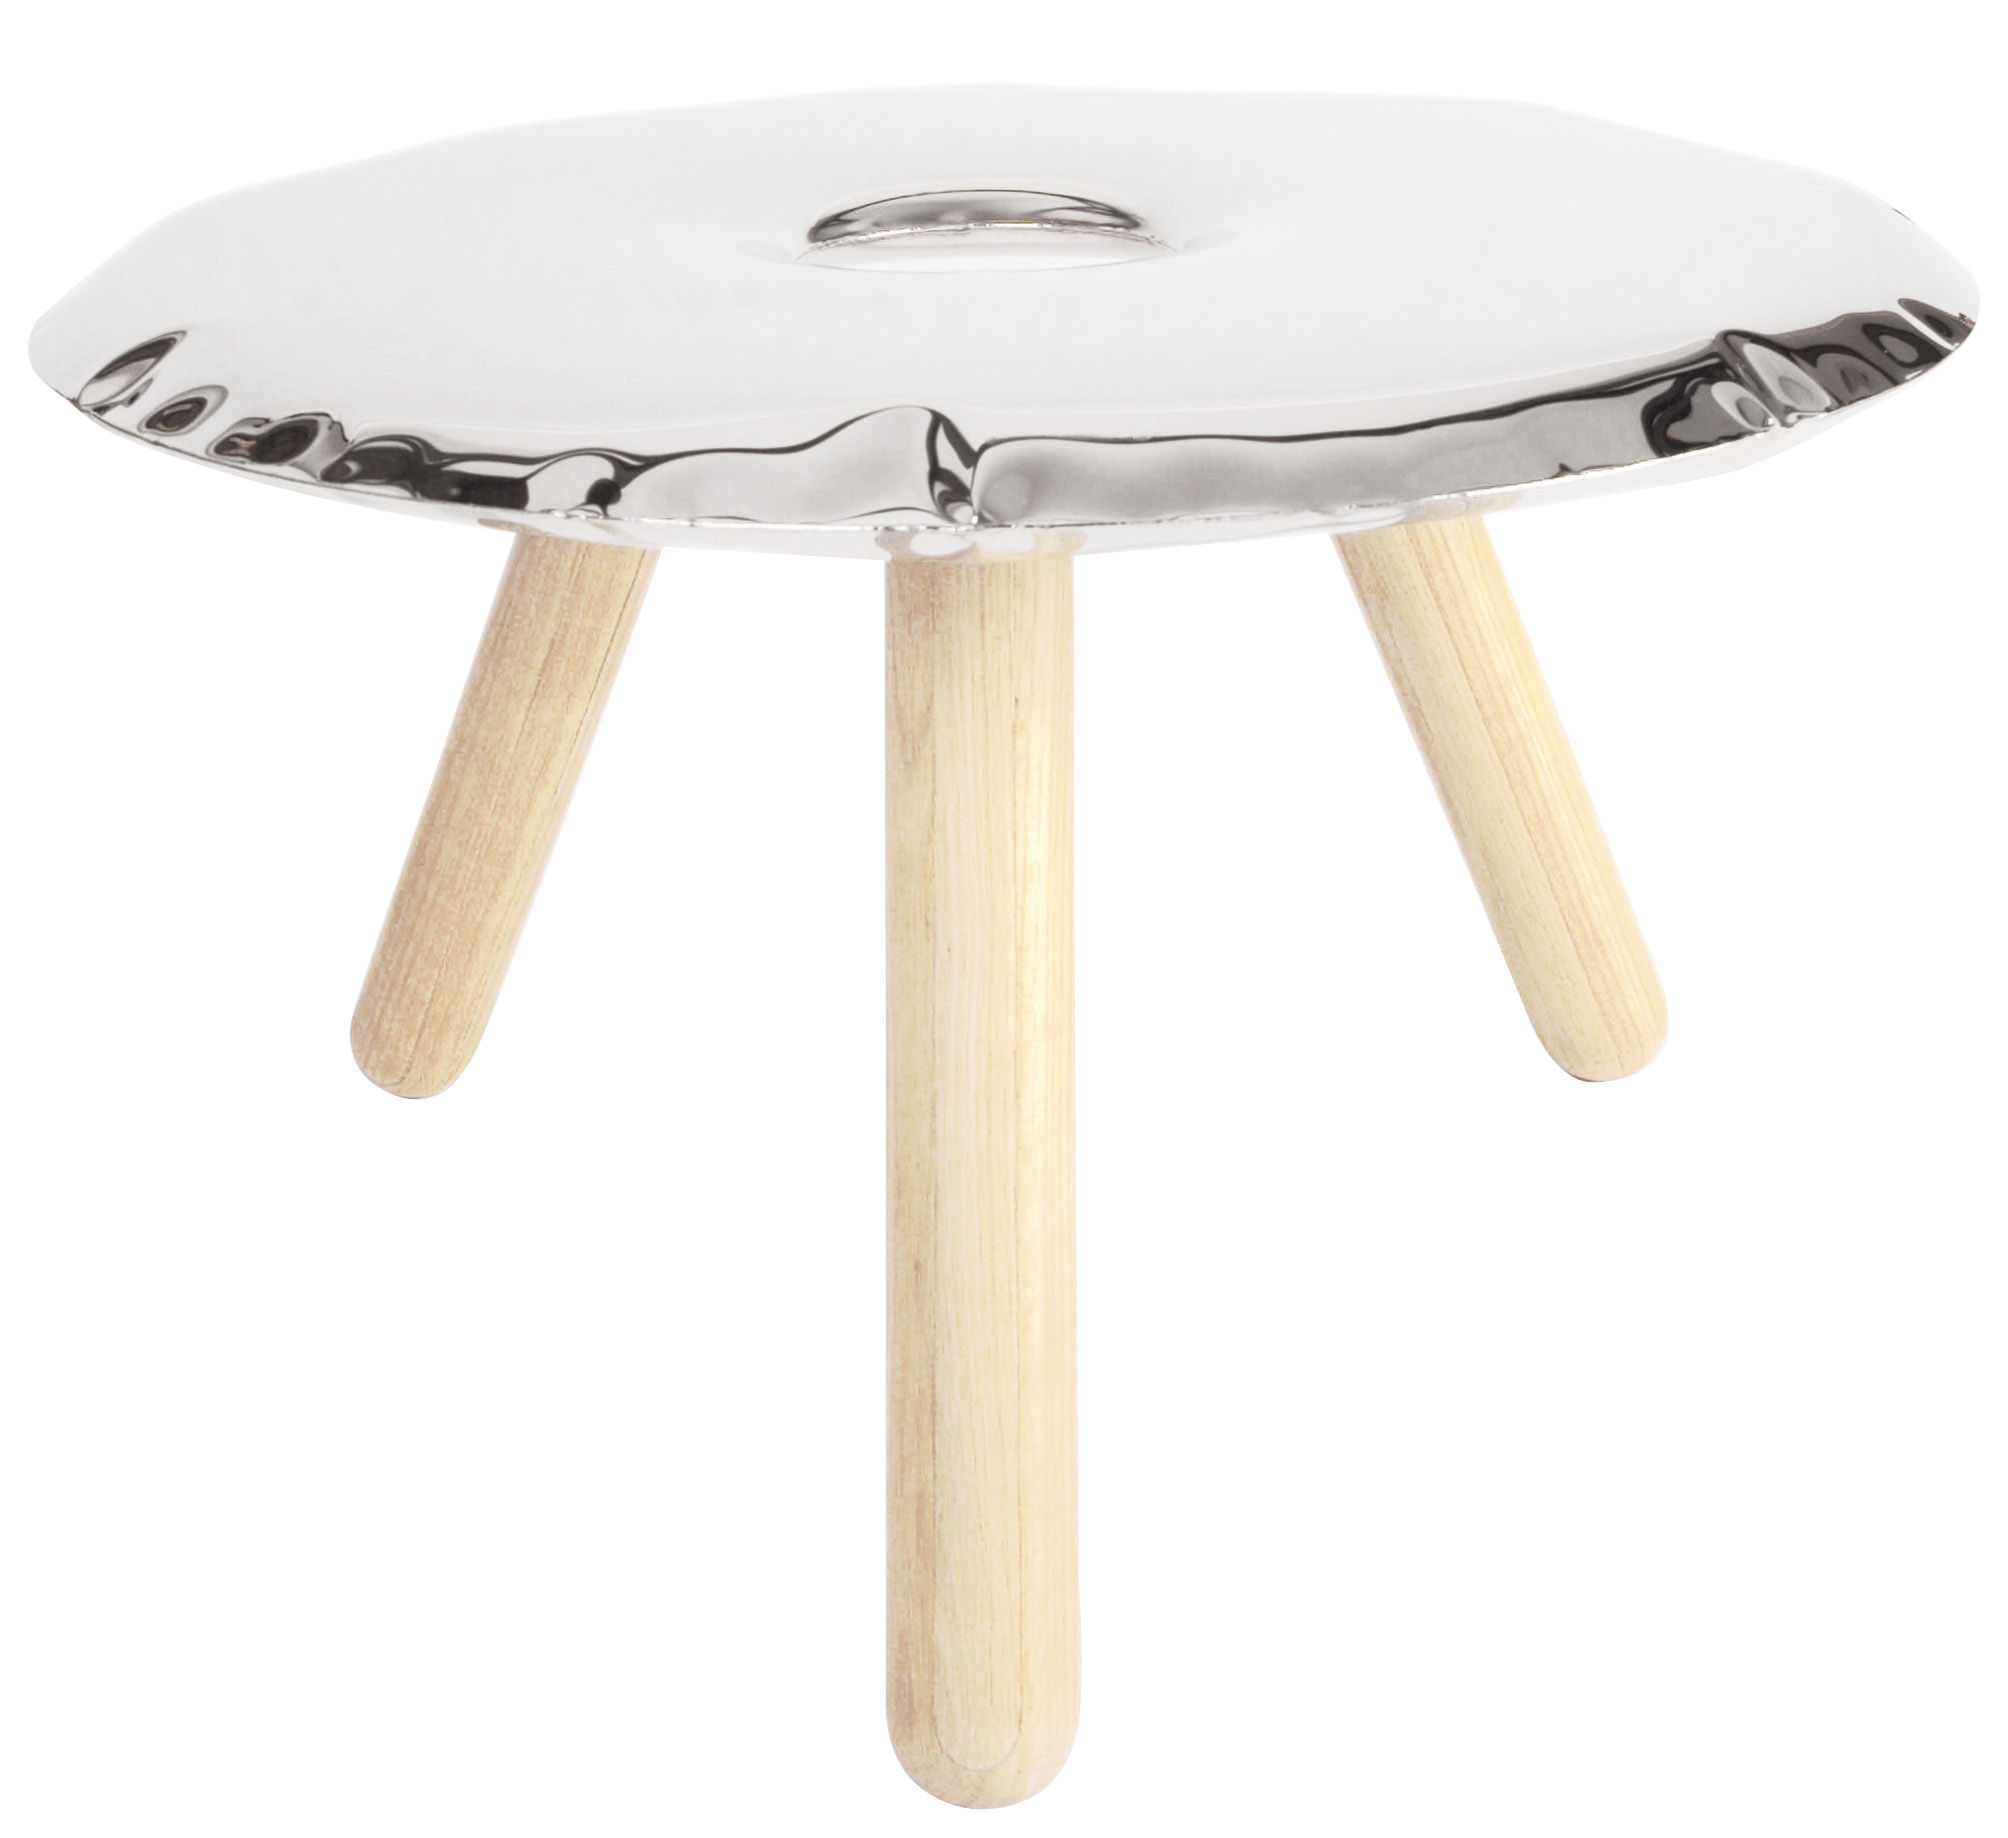 Ufo Couchtisch O 75 Cm Edelstahl Poliert Glanzend Holz By Zieta